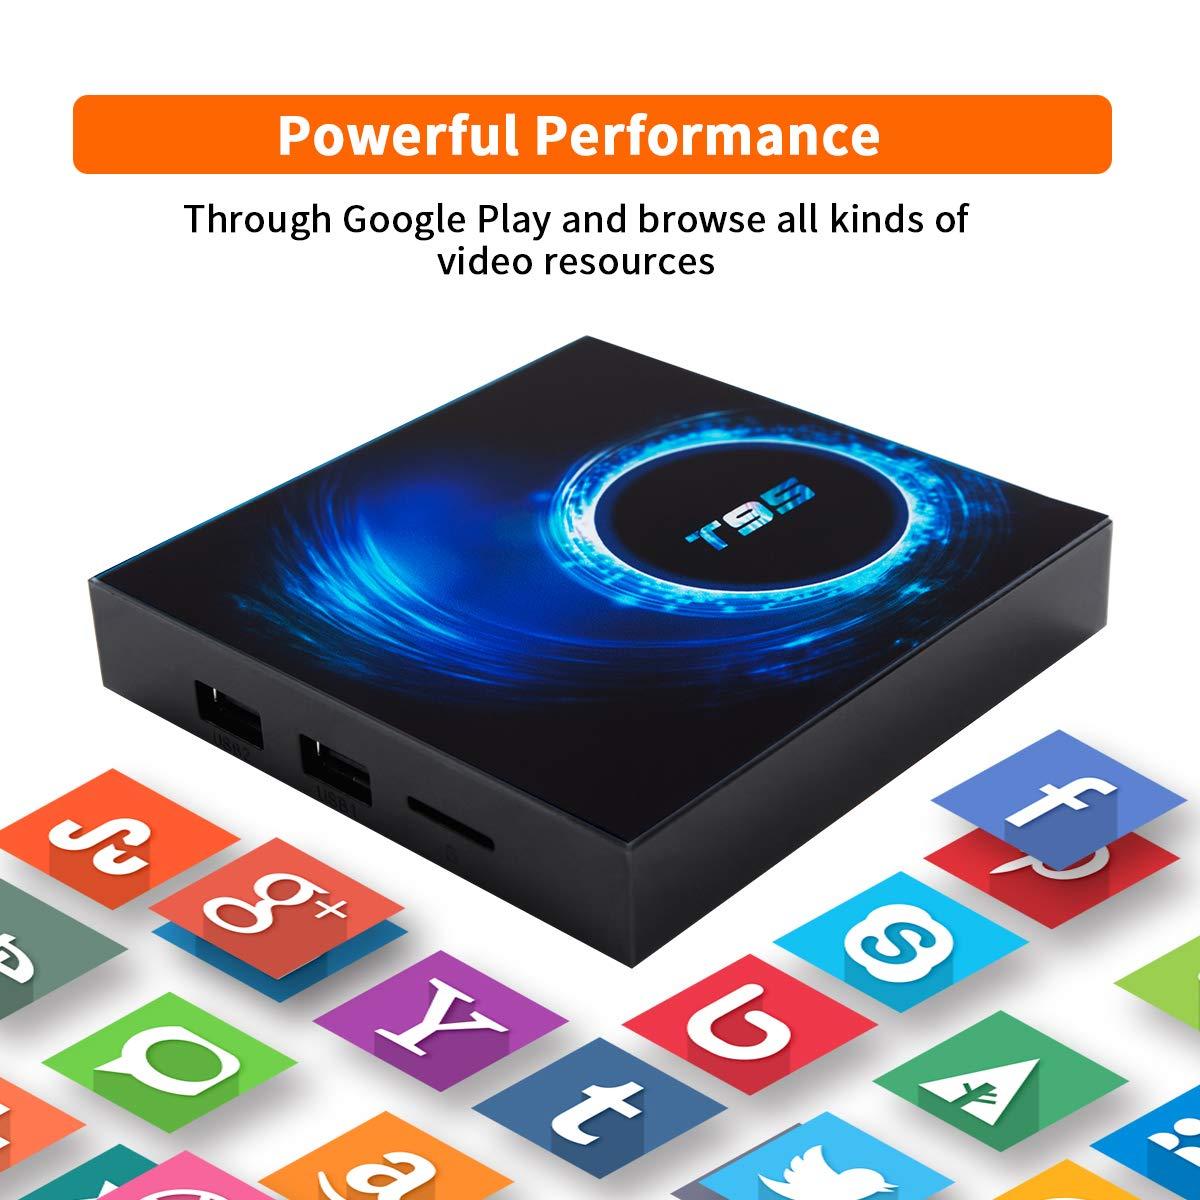 Android TV Box, Android 10.0 TV Box 4GB RAM 64GB ROM Allwinner H616 Quad-Core 64bit,Smart TV Box Soporte 2.4G/5GHz WiFi 6K / 4K Ultra HD / 3D / H.265 Android Box: Amazon.es: